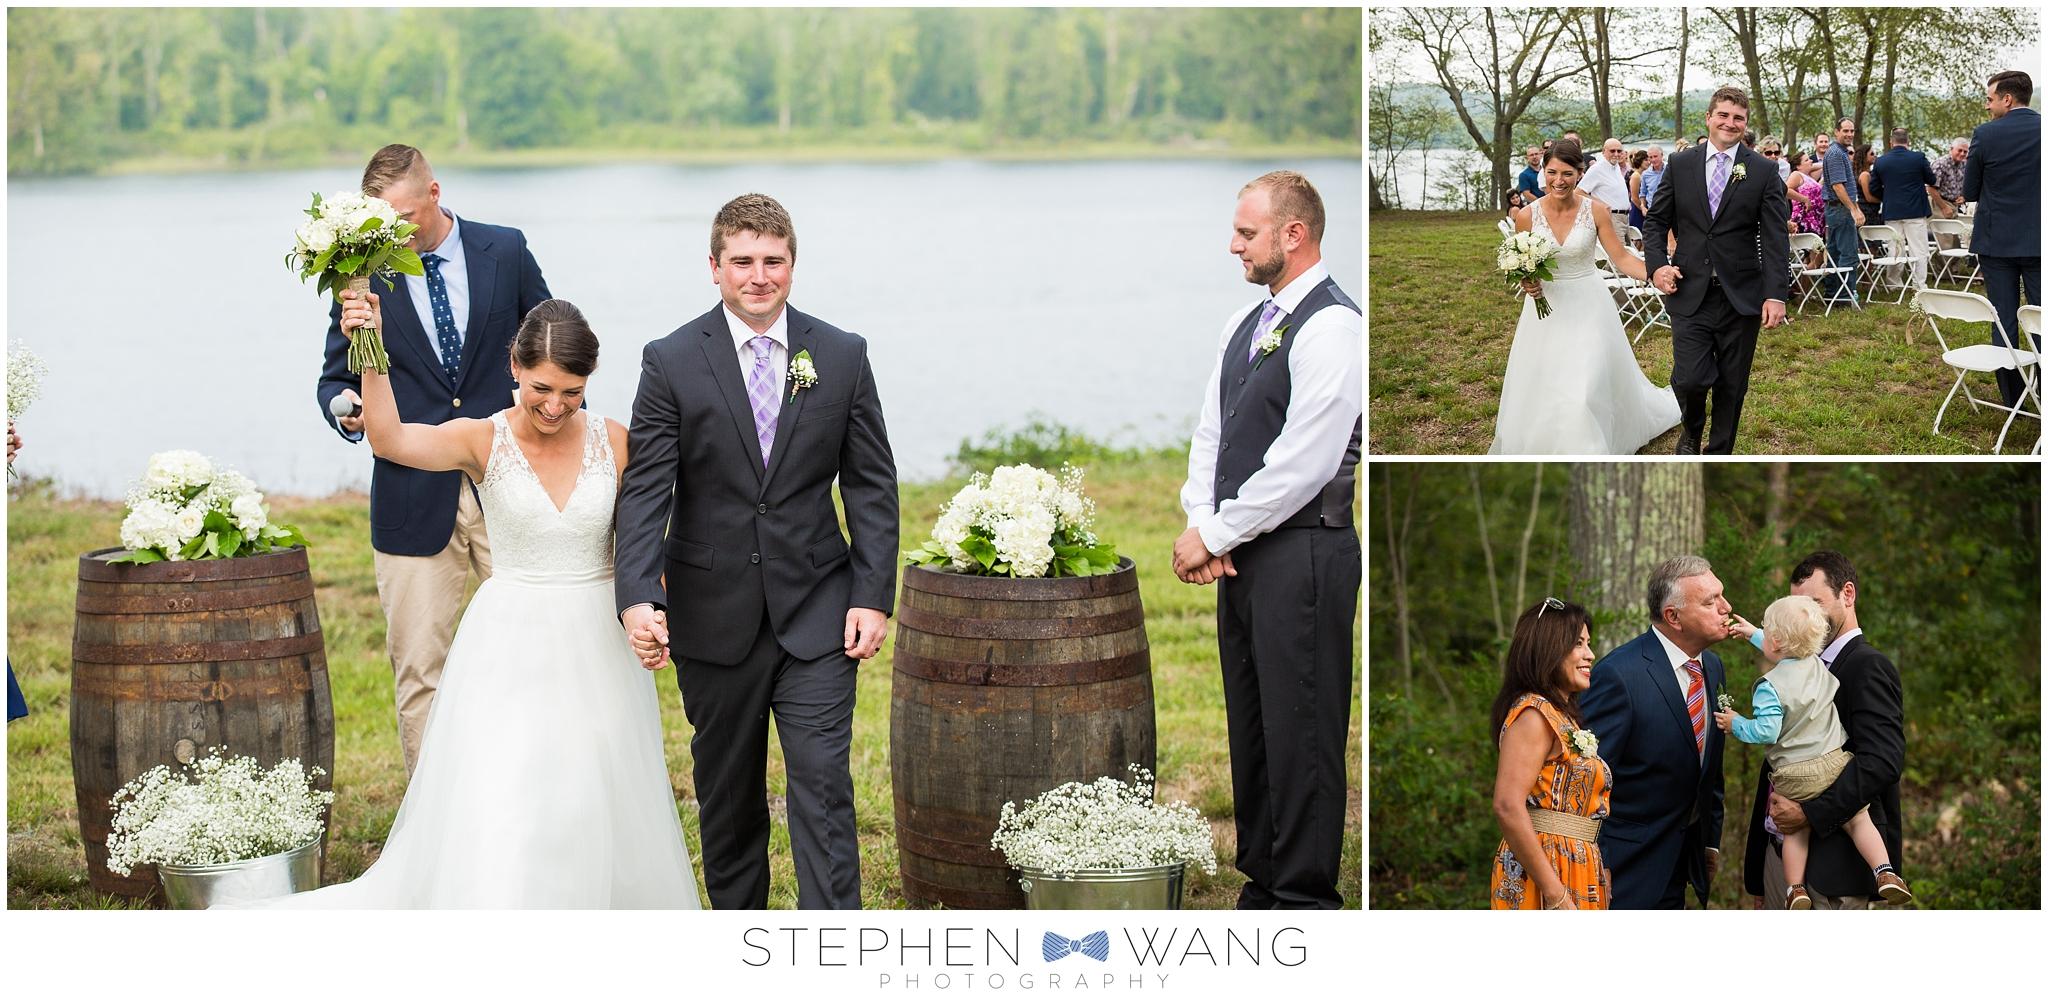 Stephen Wang Photography wedding photographer haddam connecticut wedding connecticut photographer philadlephia photographer pennsylvania wedding photographer bride and groom00027.jpg